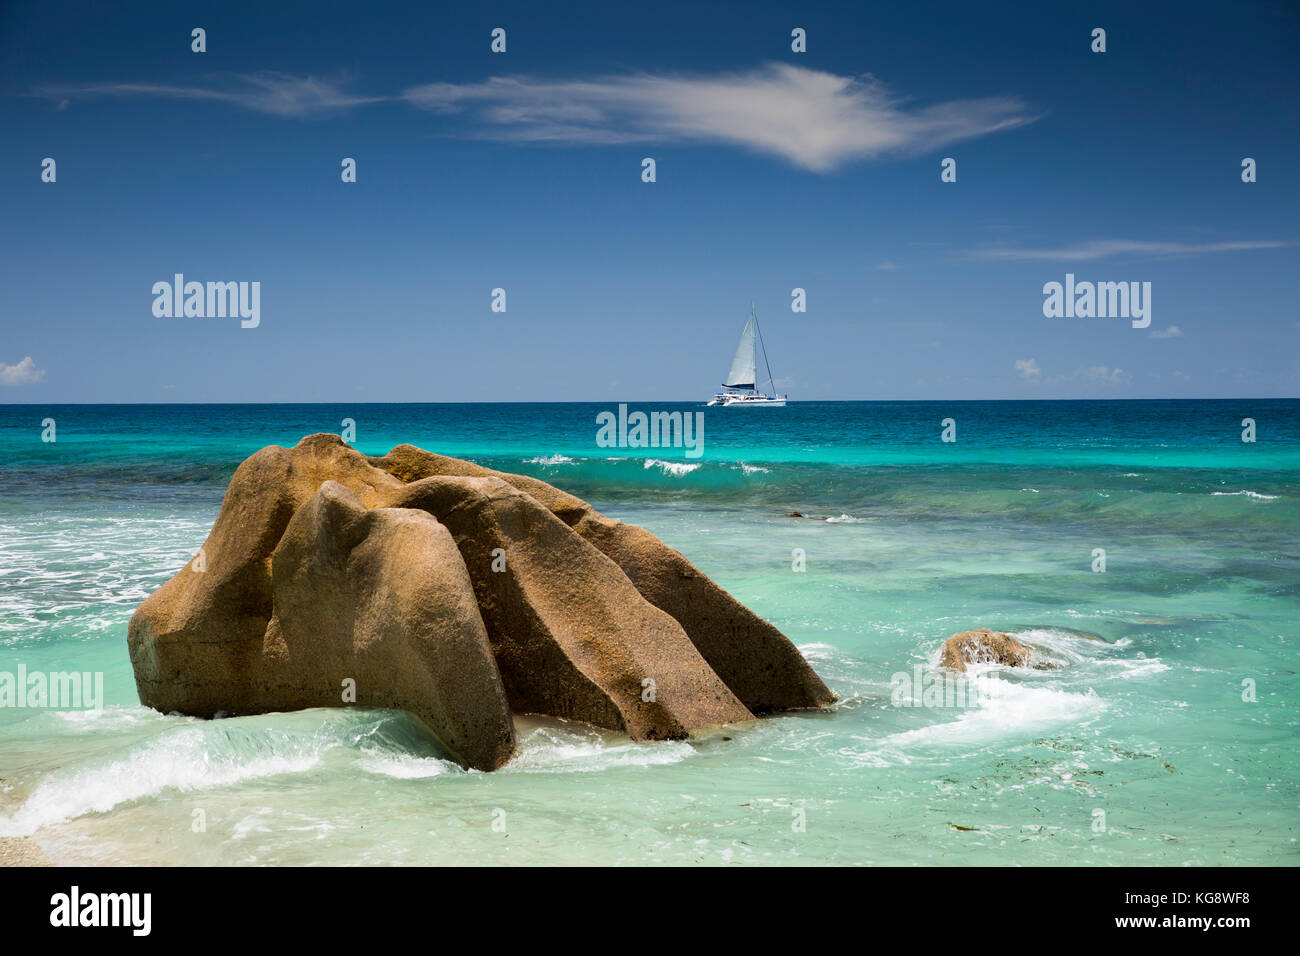 The Seychelles, La Digue, Anse Grosse Roche, sailing catamaran passing huge granite rocks - Stock Image